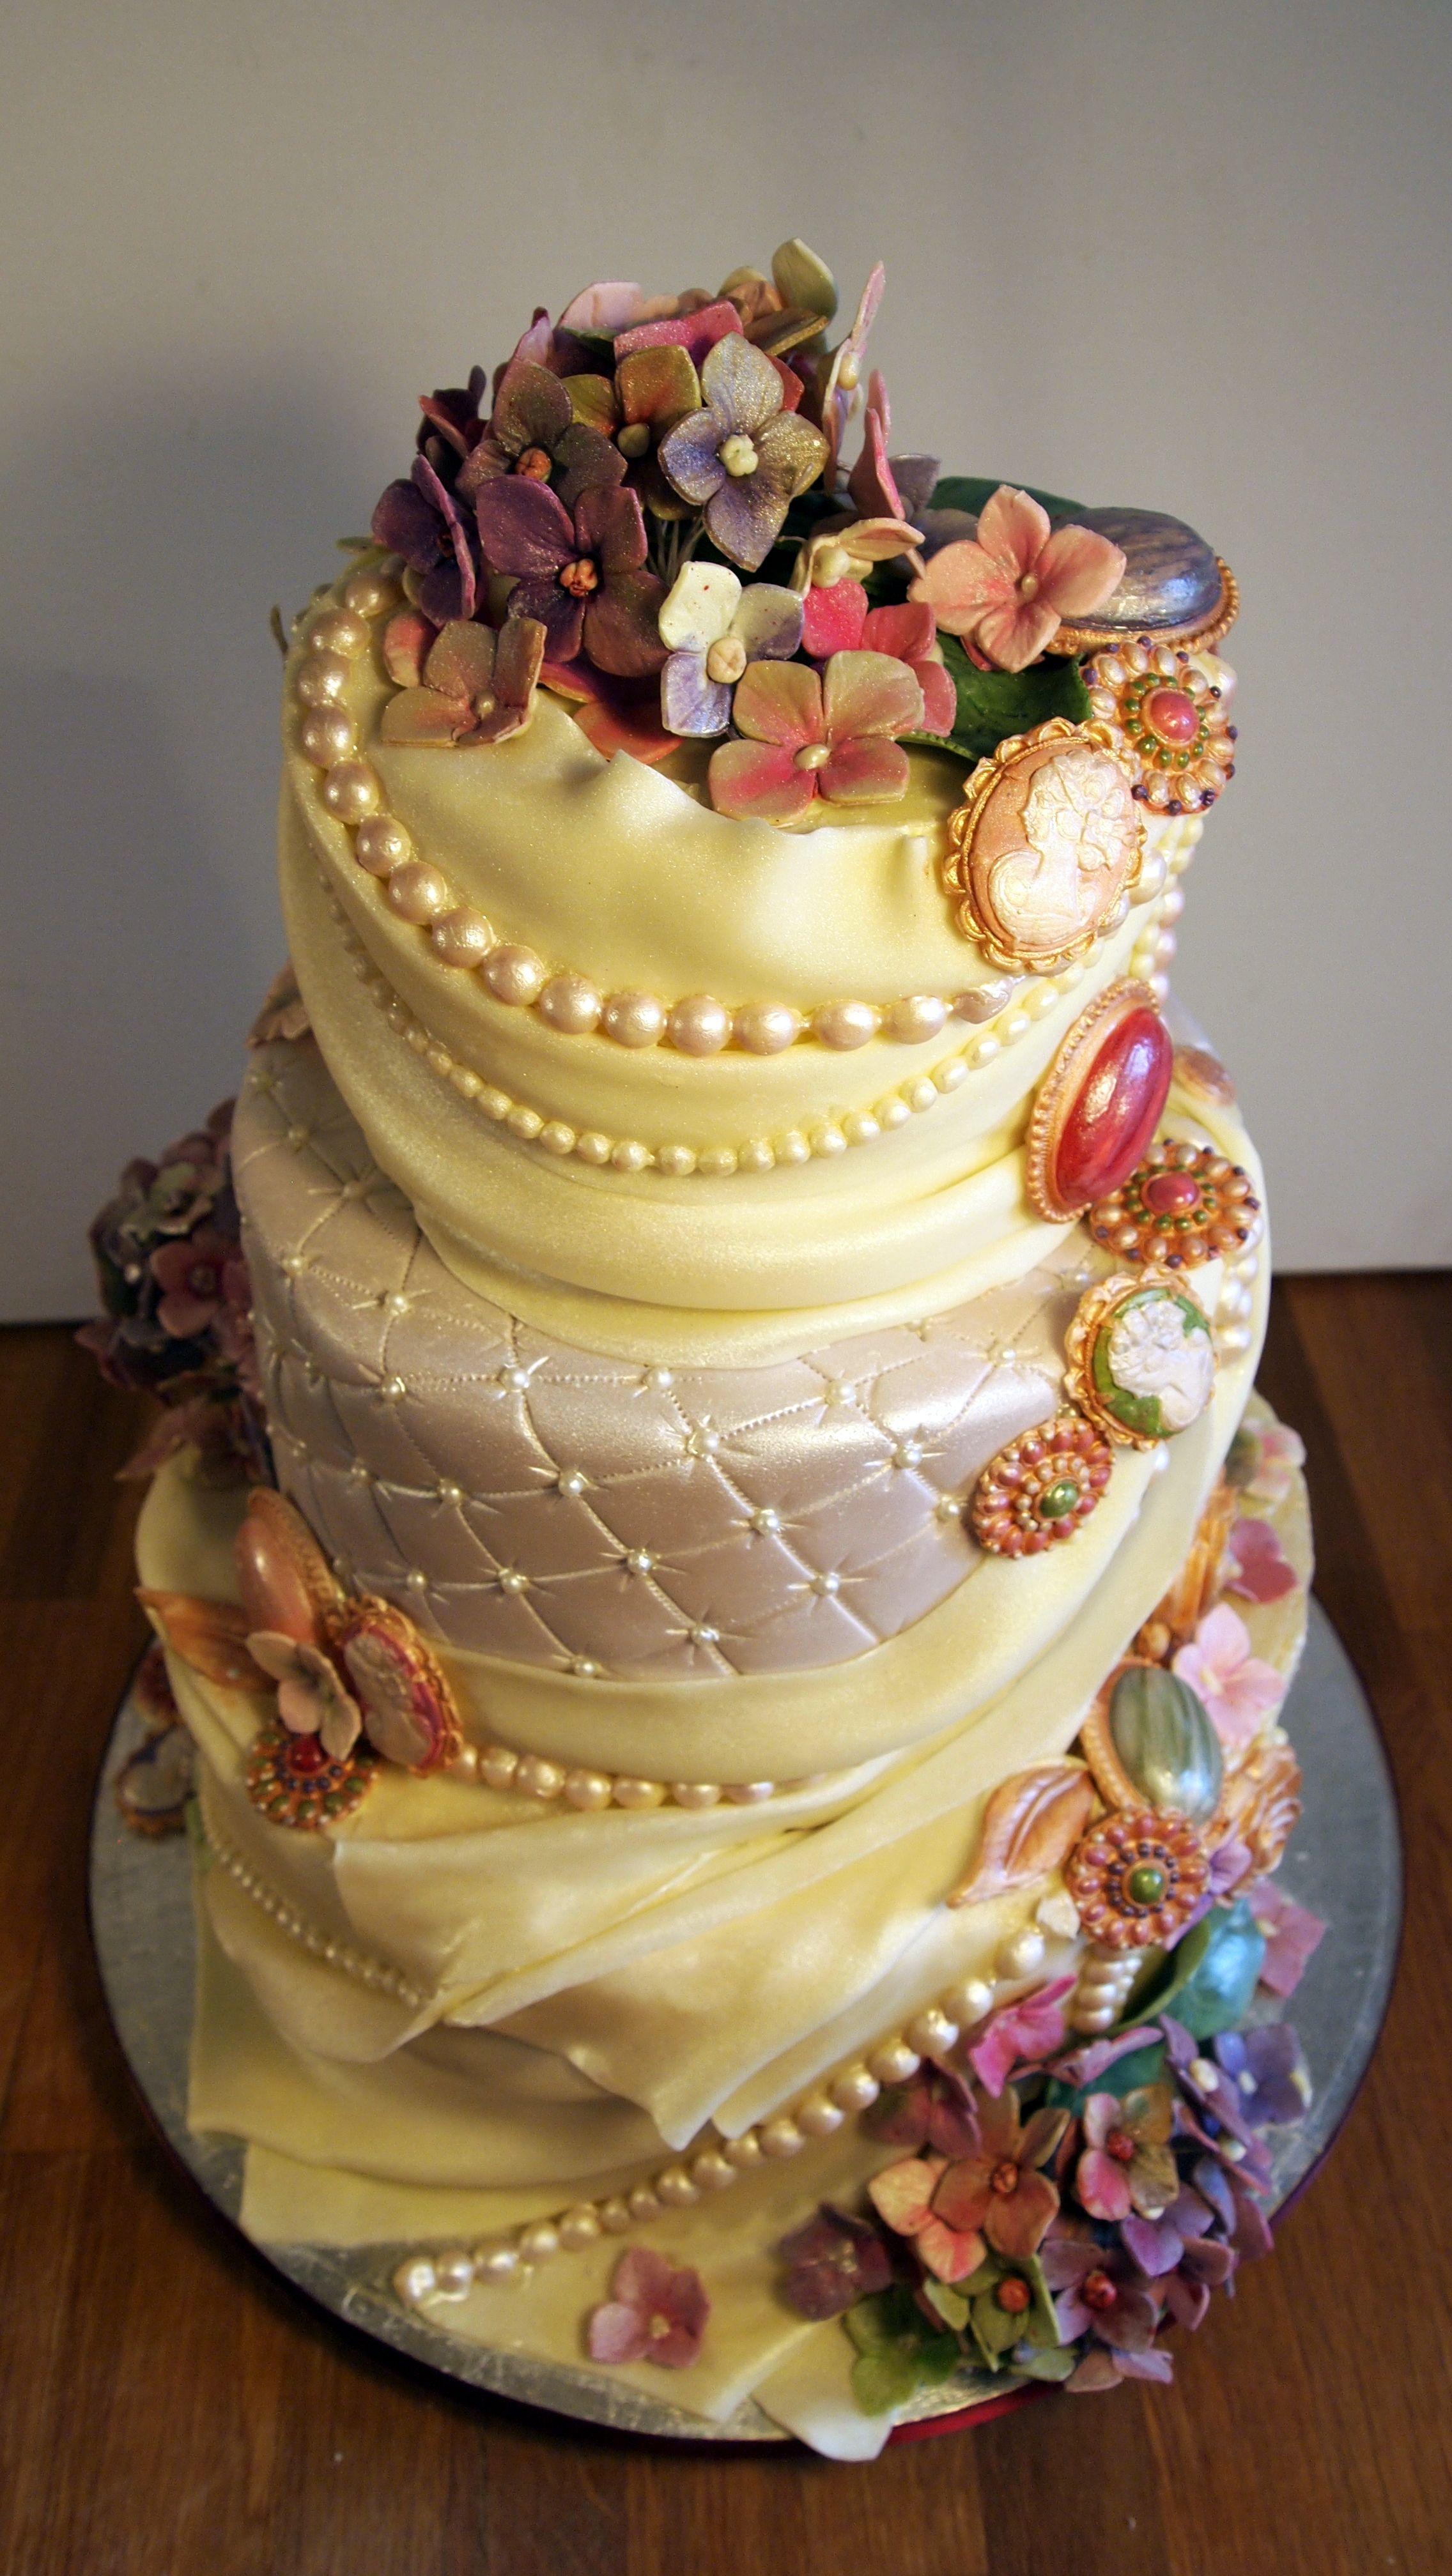 chocolate wedding cake | Cakes and Cupcakes | Pinterest | Wedding ...